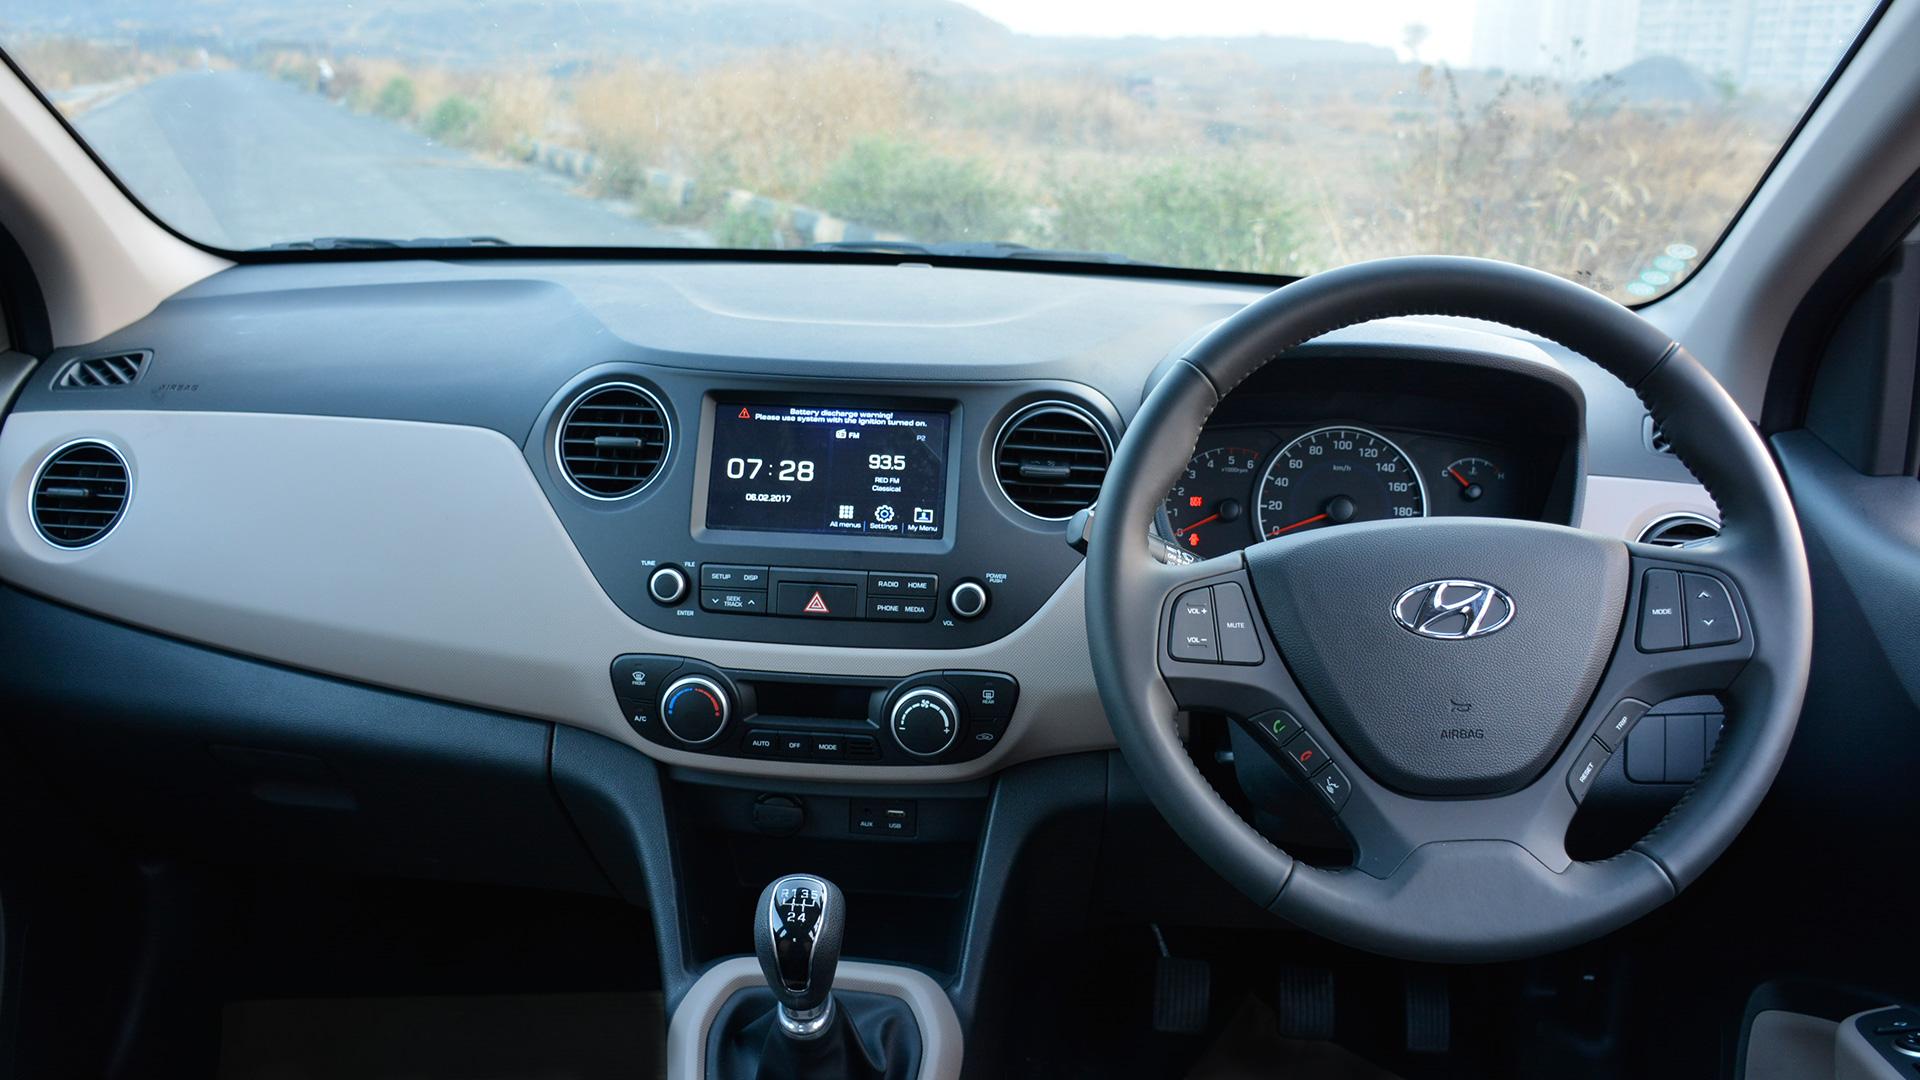 Hyundai Grand i10 2017 Asta Diesel - Price, Mileage ...